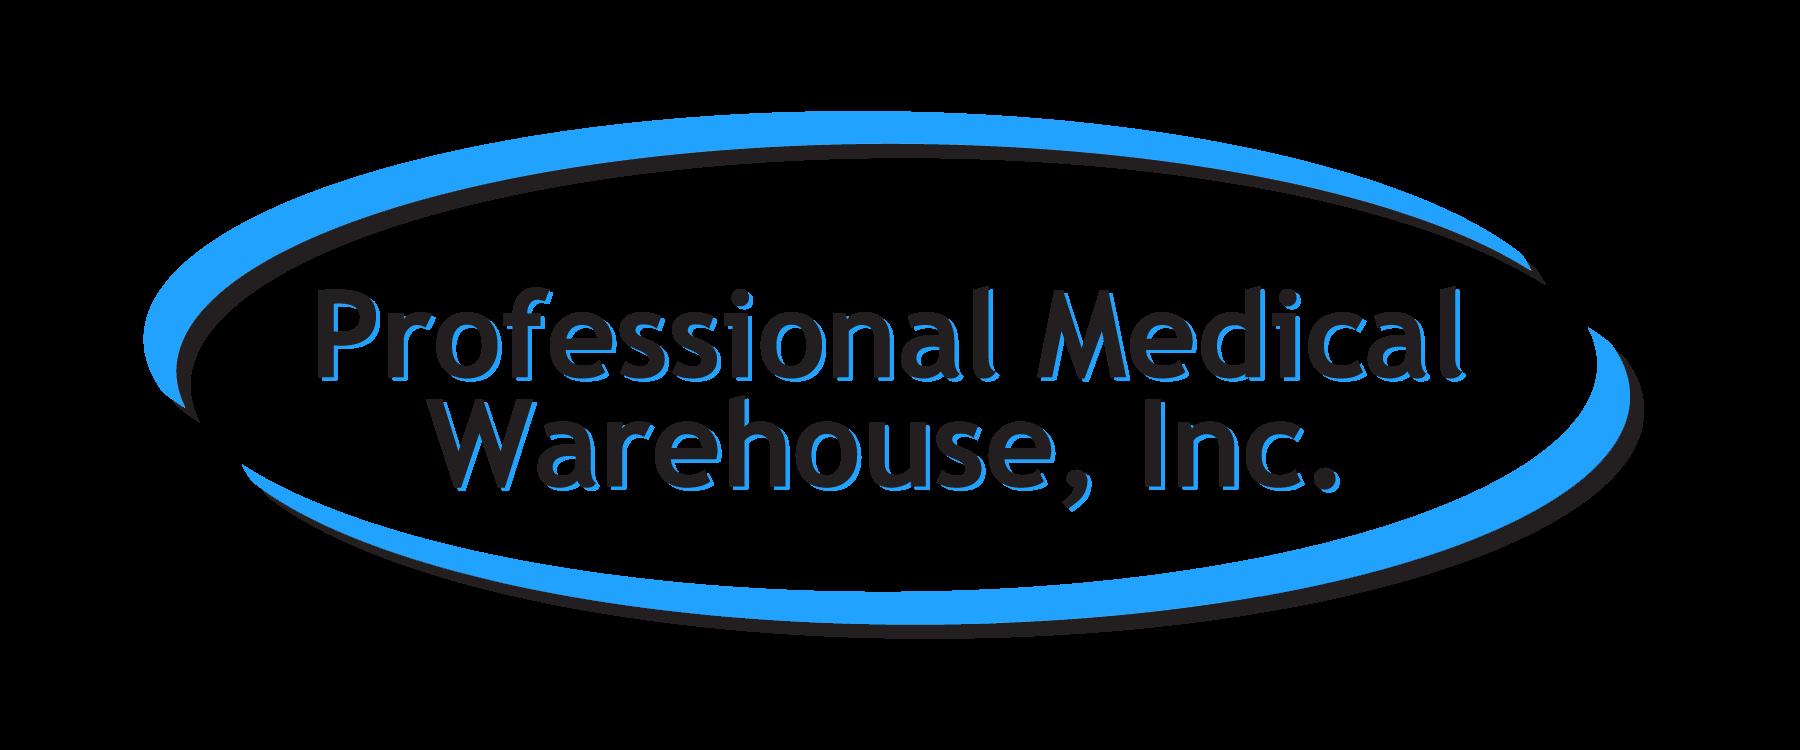 Professional Medical Warehouse, Inc.